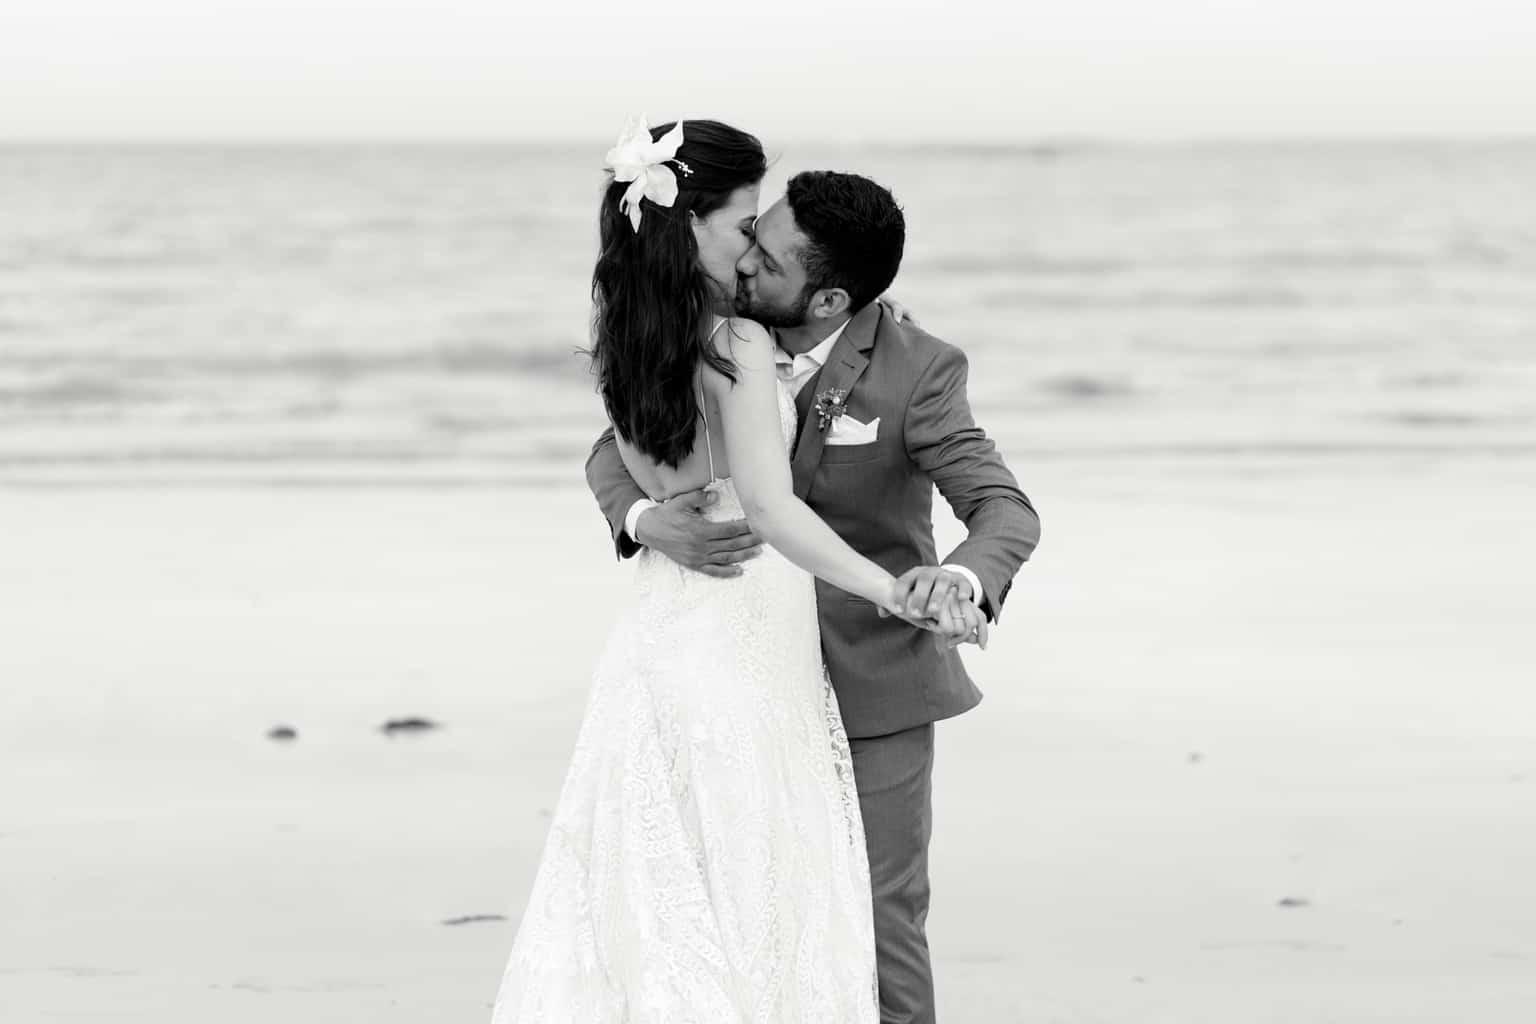 Casamento-Emanuelle-e-Alysson-Fotografia-Tadeu-Nanó-e-Luca-Antunes-938